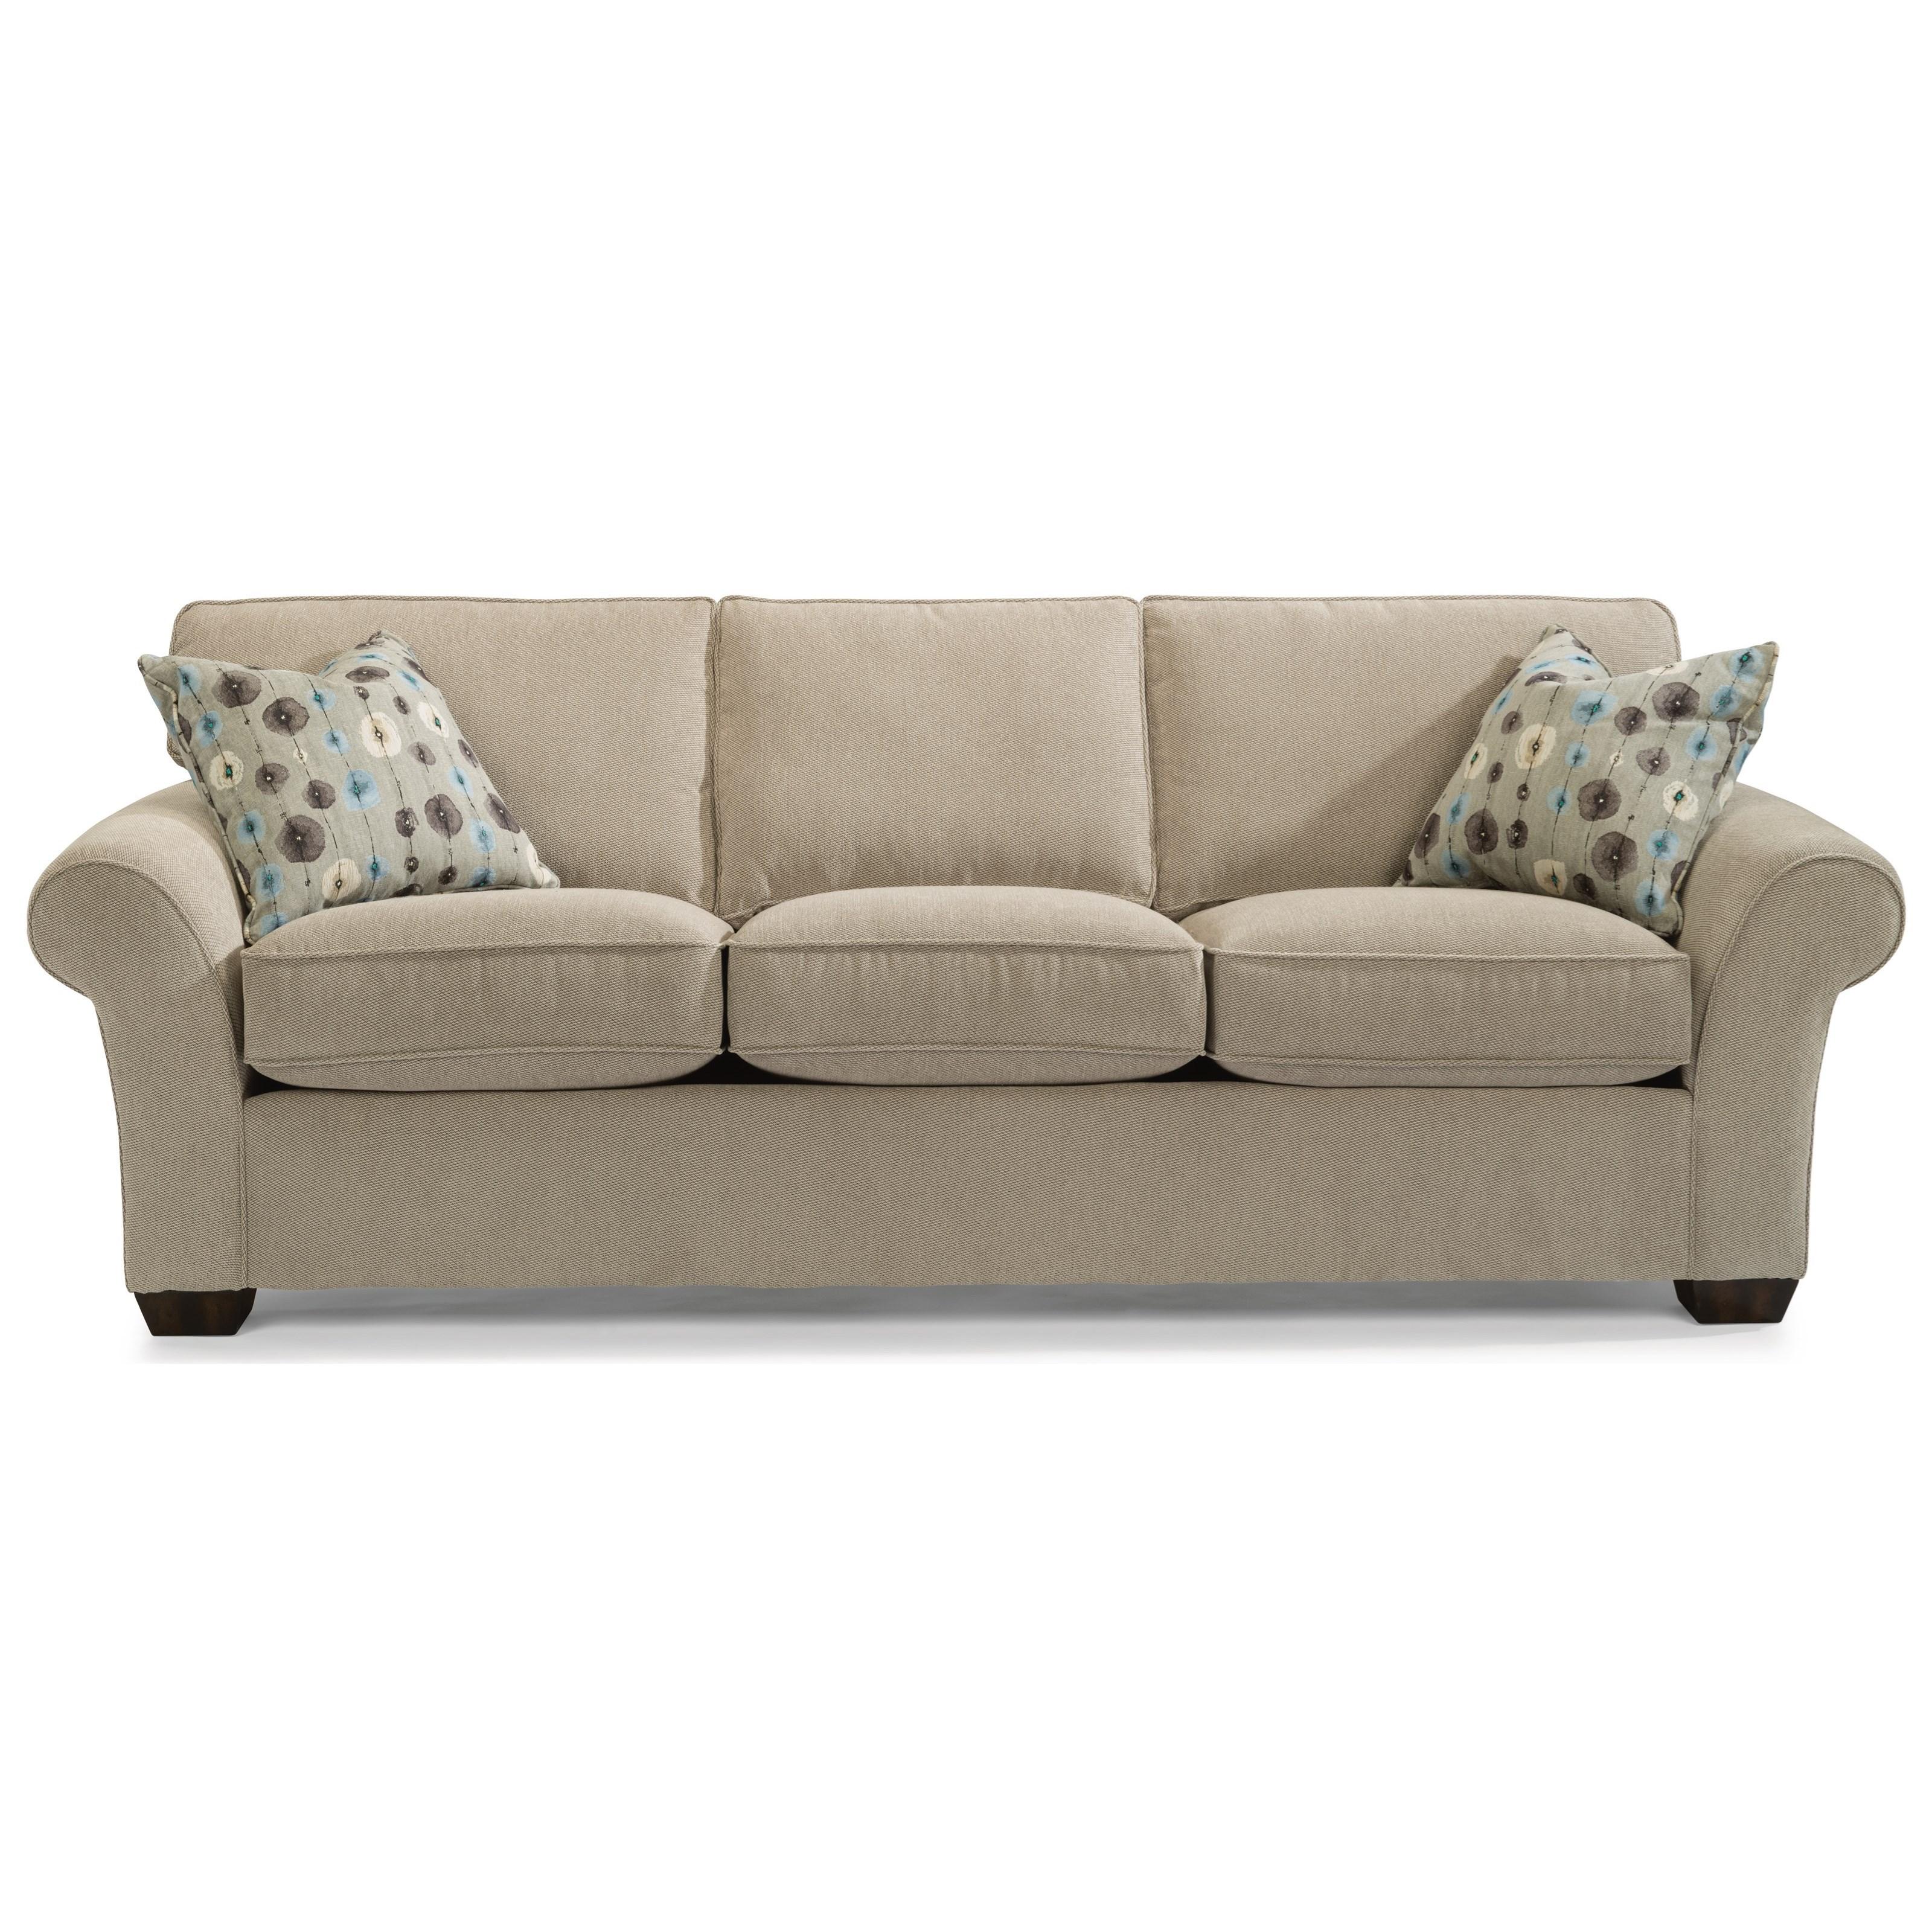 "Flexsteel Furniture Uk: Flexsteel Vail 7305-31 91"" Vail Three Cushion Sofa"